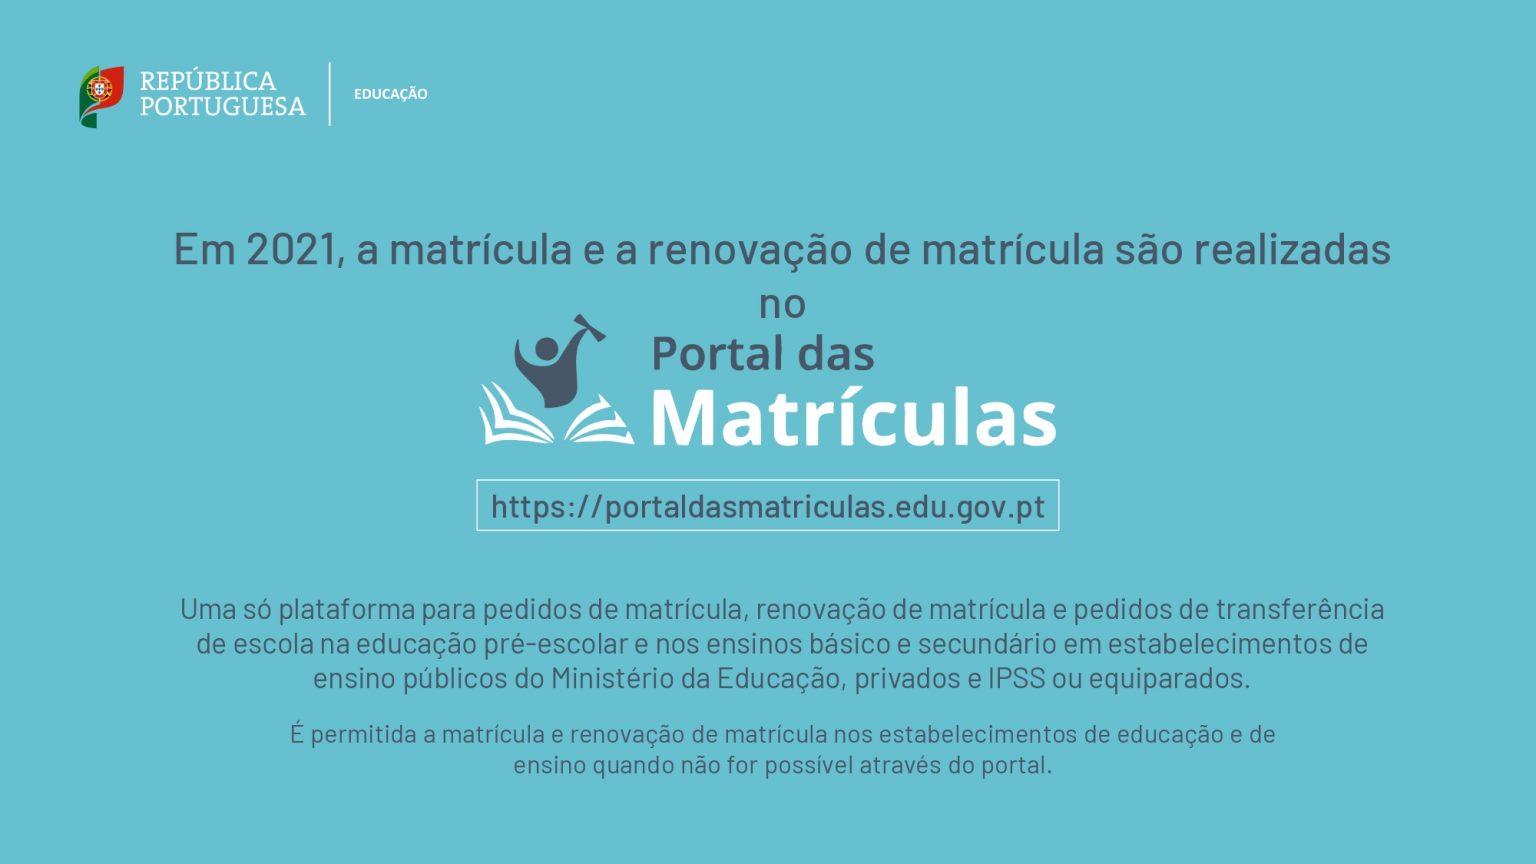 PPT_MatriculasParaEE_Regras_AnoLetivo_2021_2022_page-0002